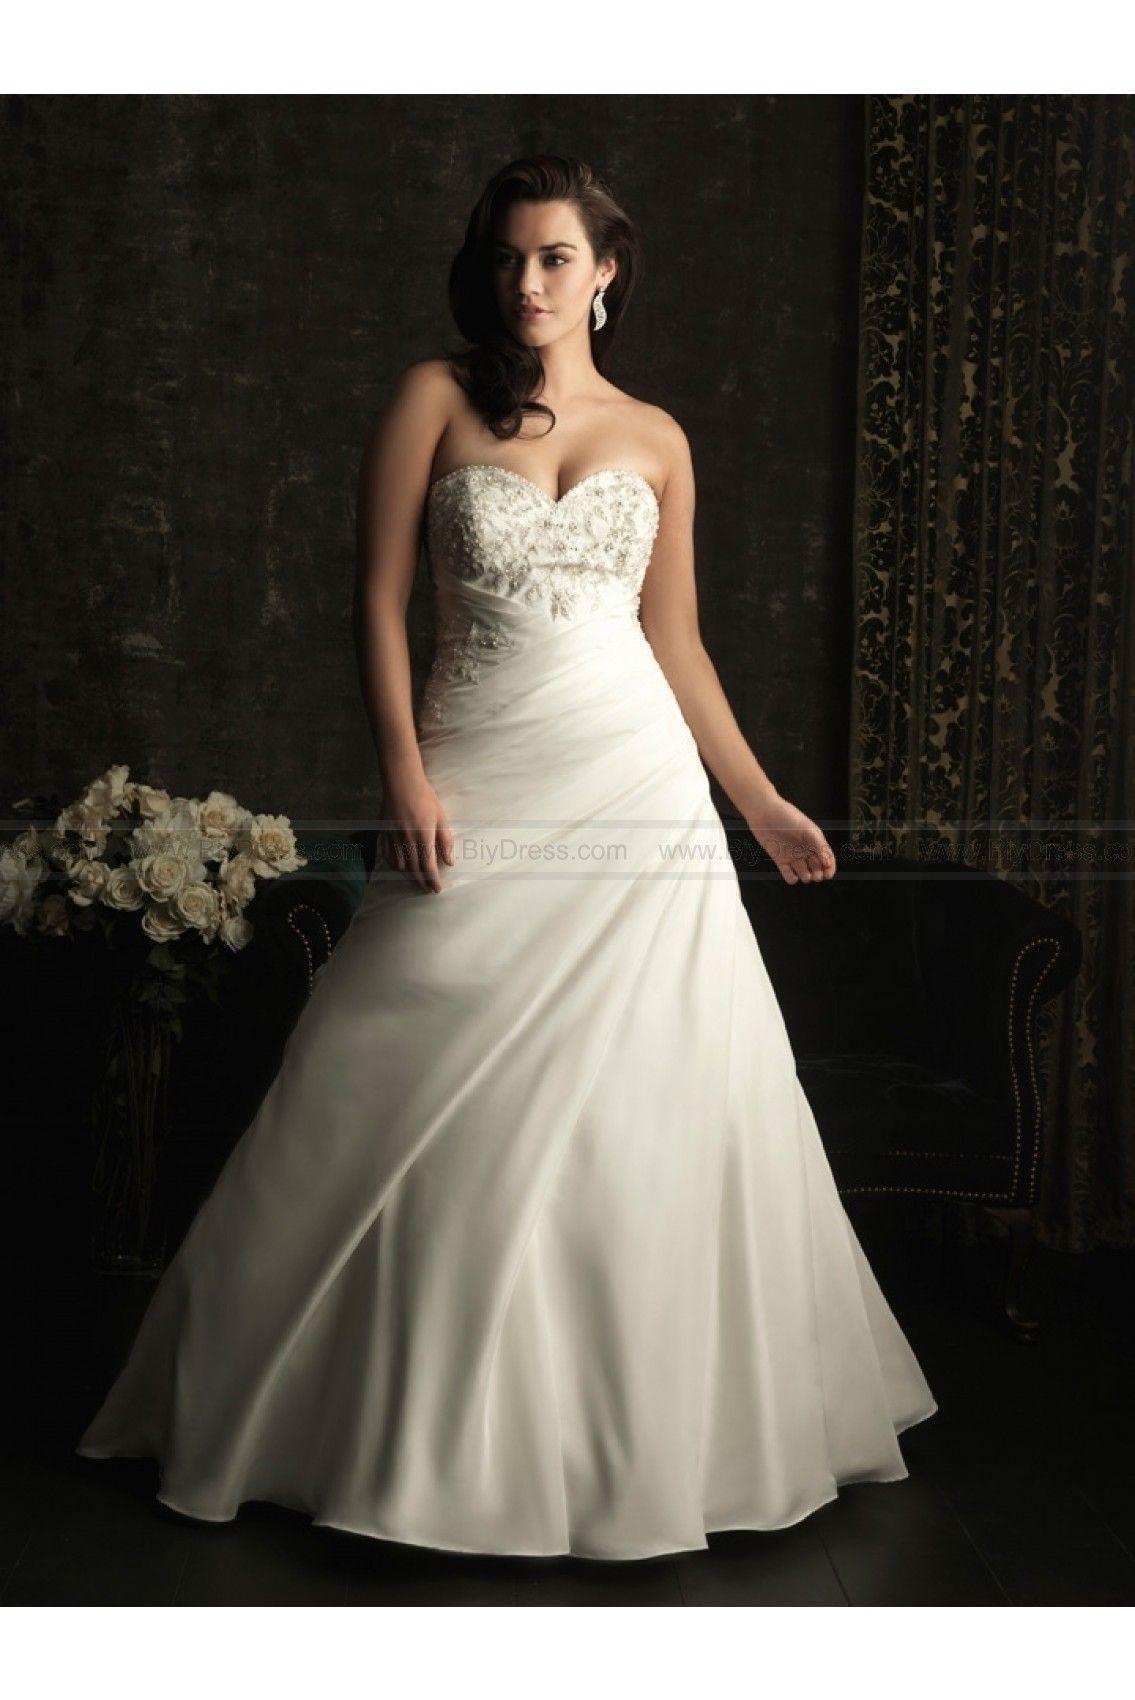 Allure Women Wedding Dresses - Style W303